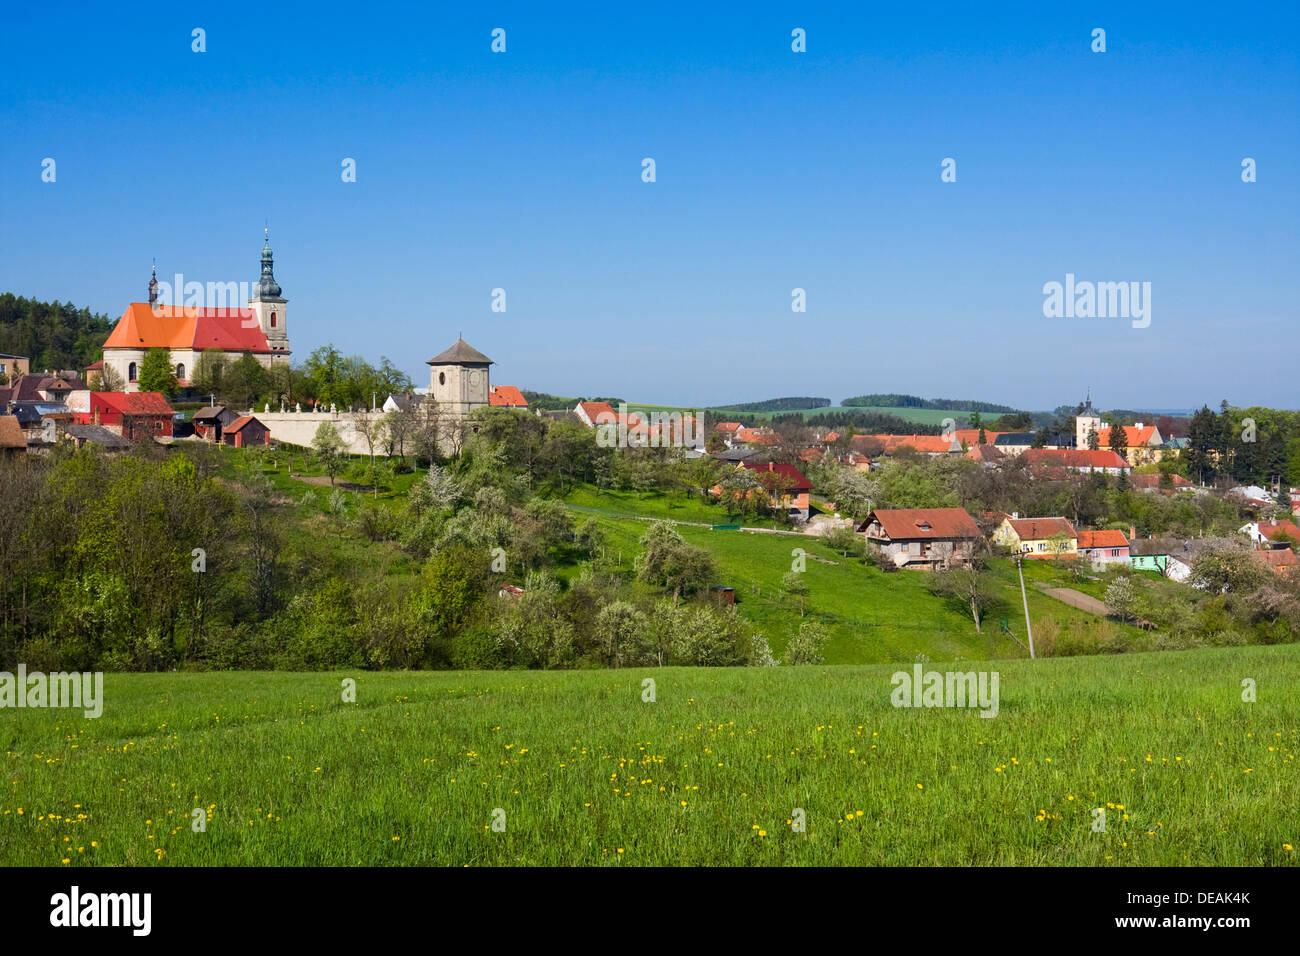 Strilky, Kromeriz district, Zlin region, Moravia, Czech Republic, Europe - Stock Image